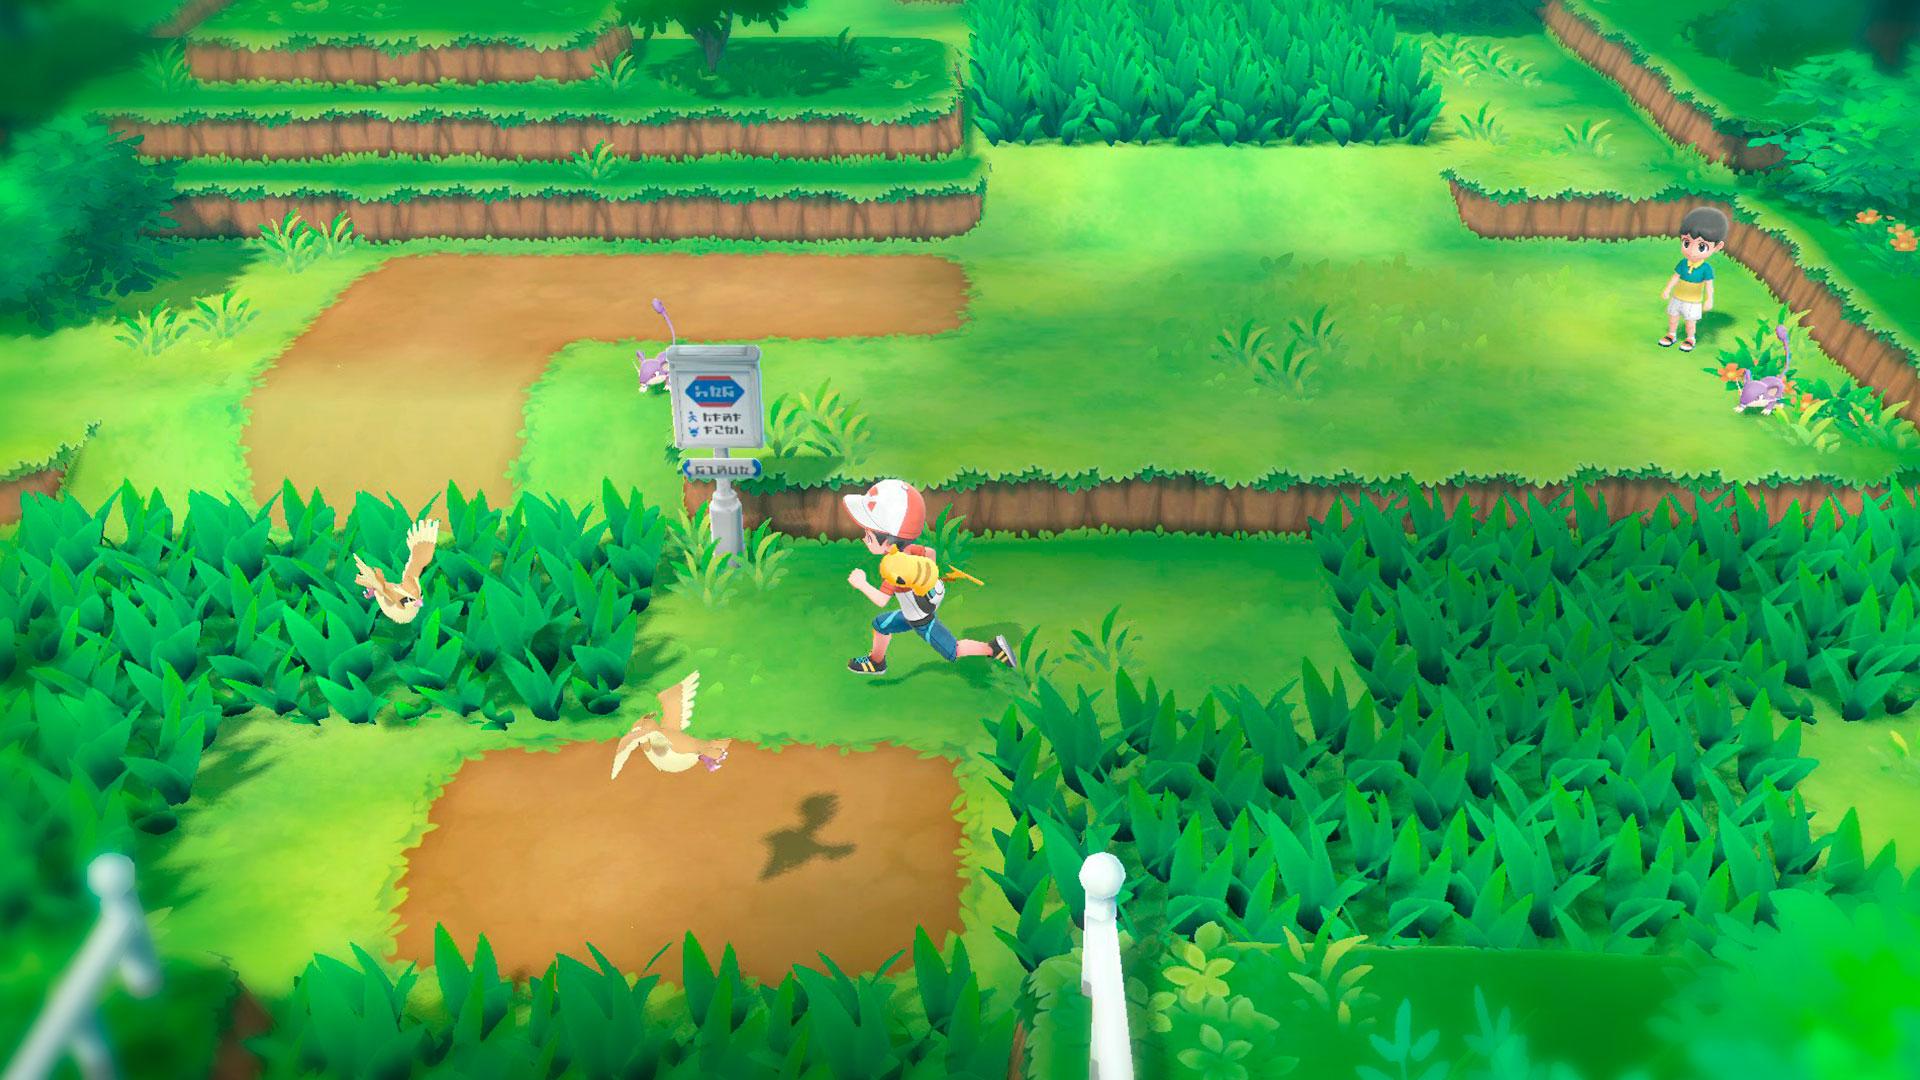 Pokémon Lets Go Pikachu аниме приключения